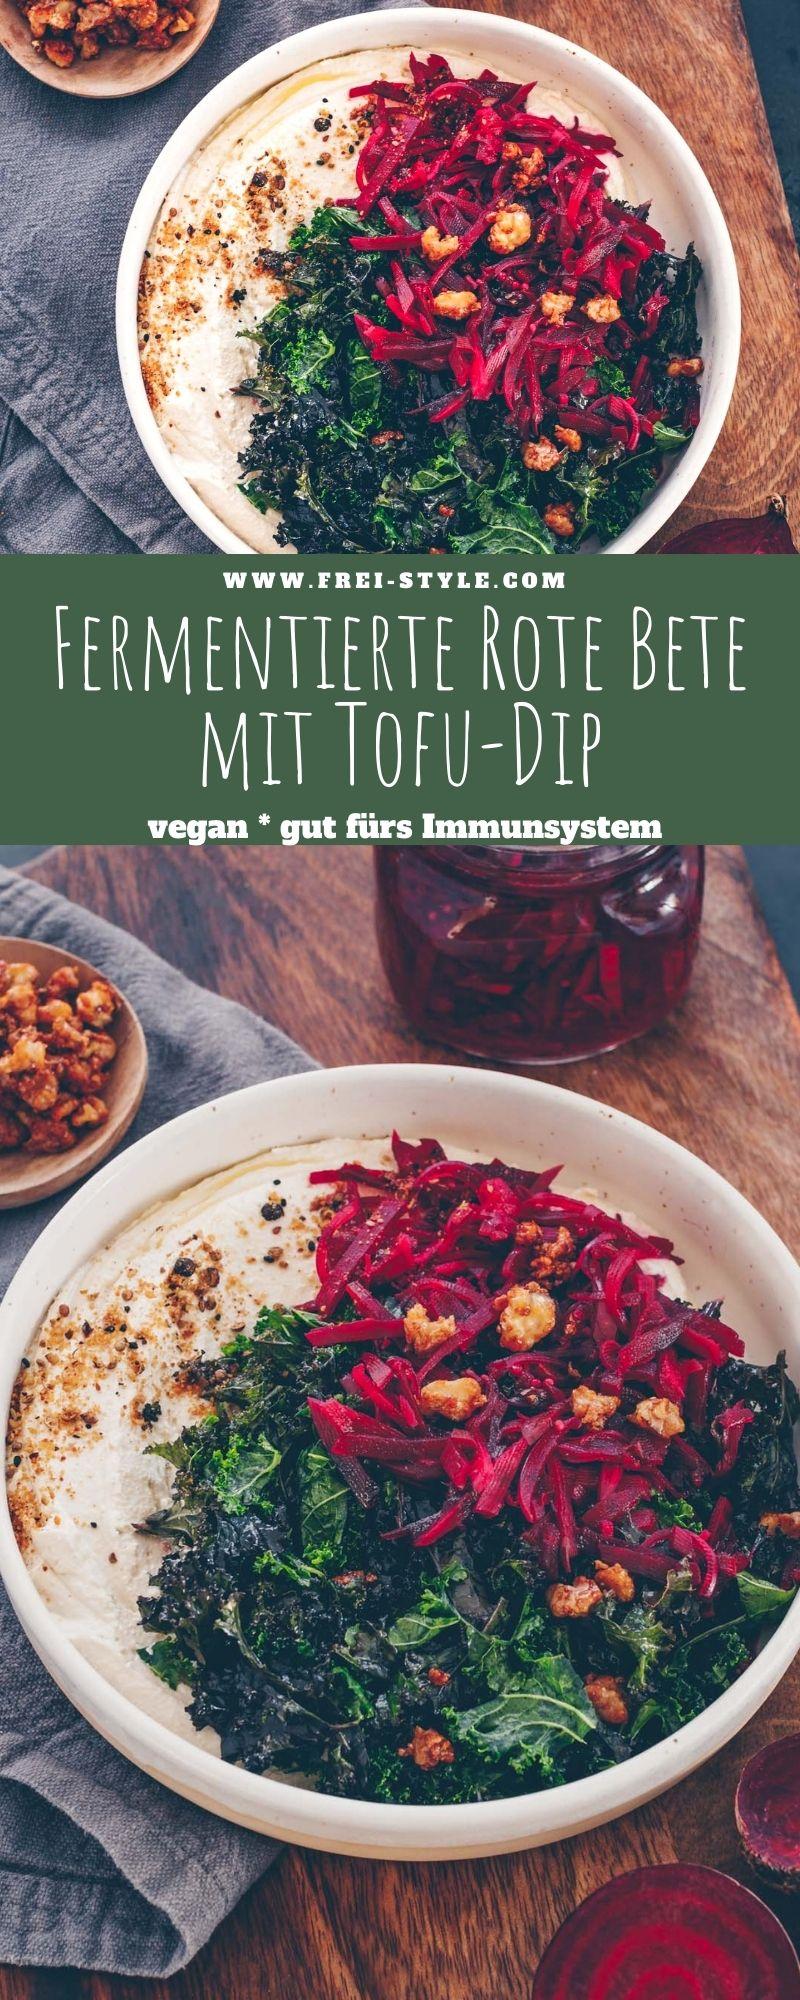 Fermentierte Rote Bete mit Tofu-Dip